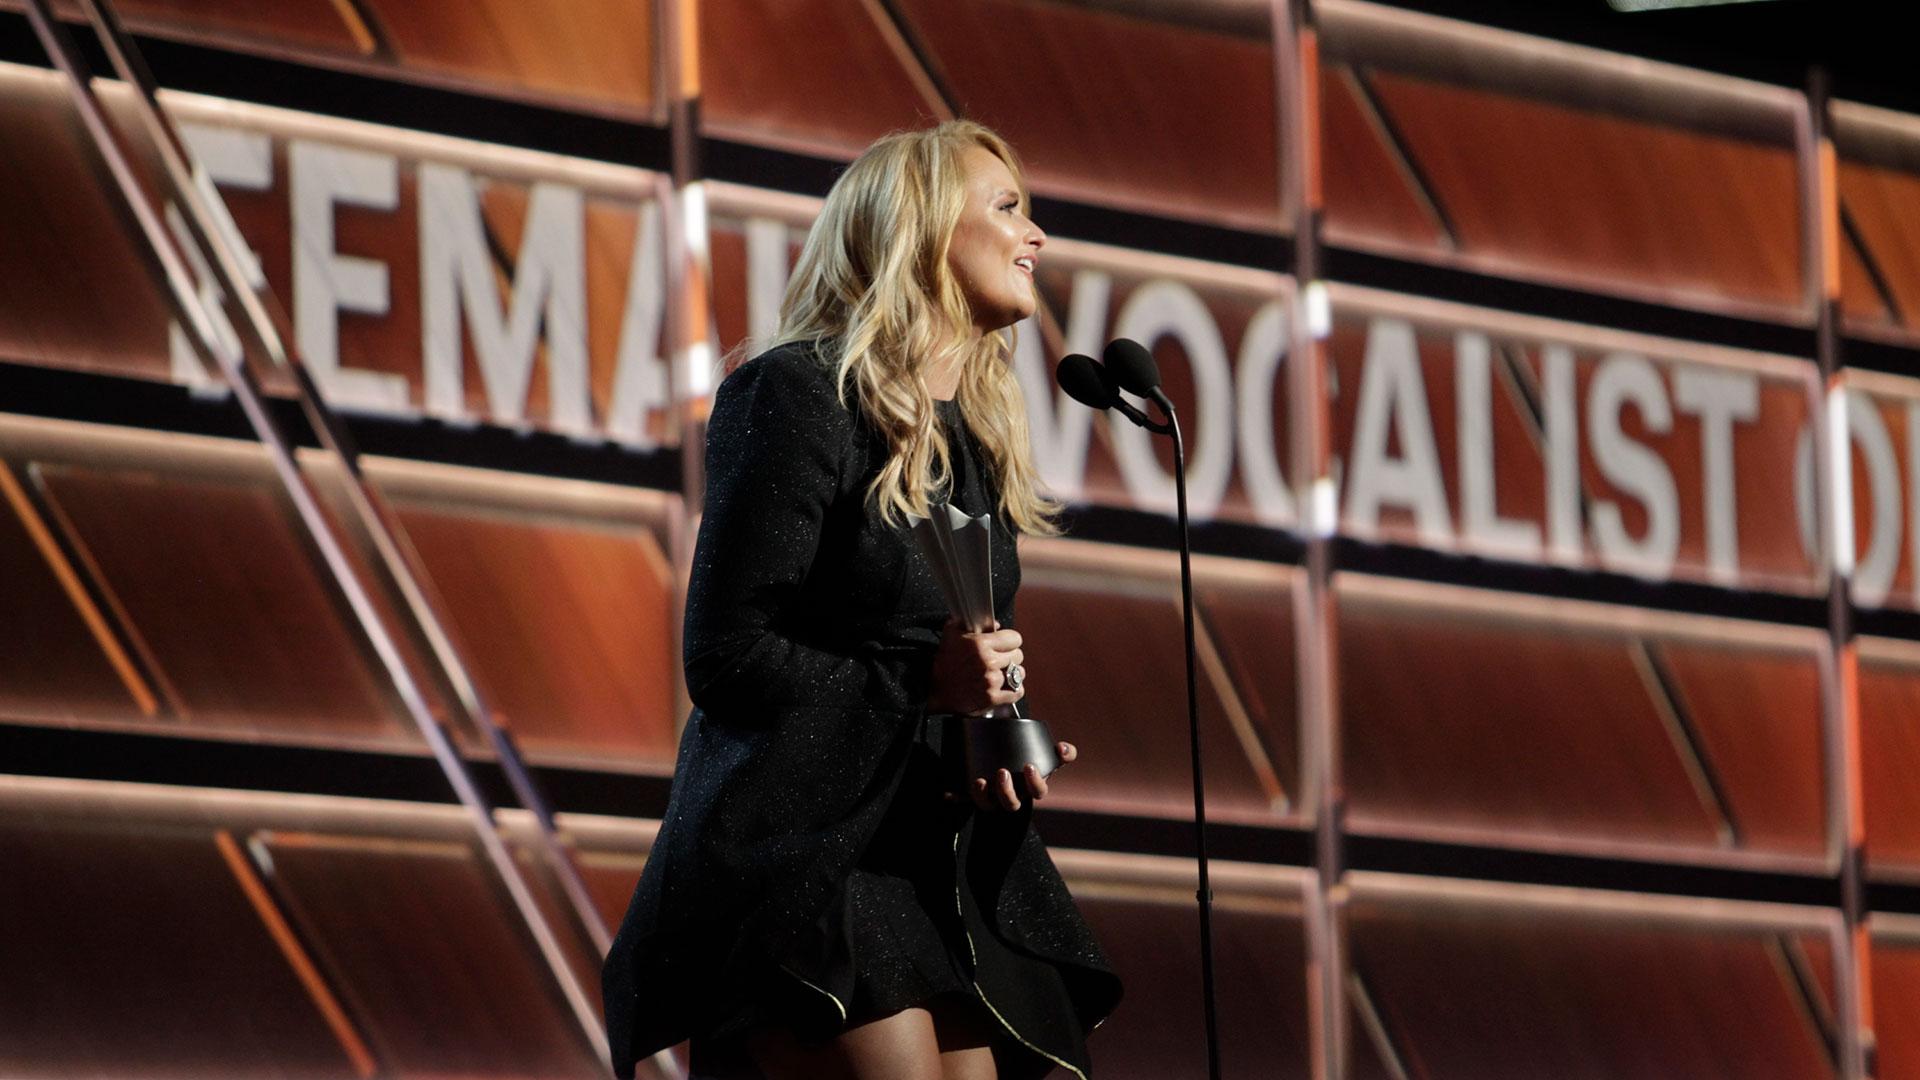 Miranda Lambert wins Female Vocalist of the Year at the 53rd ACM Awards.